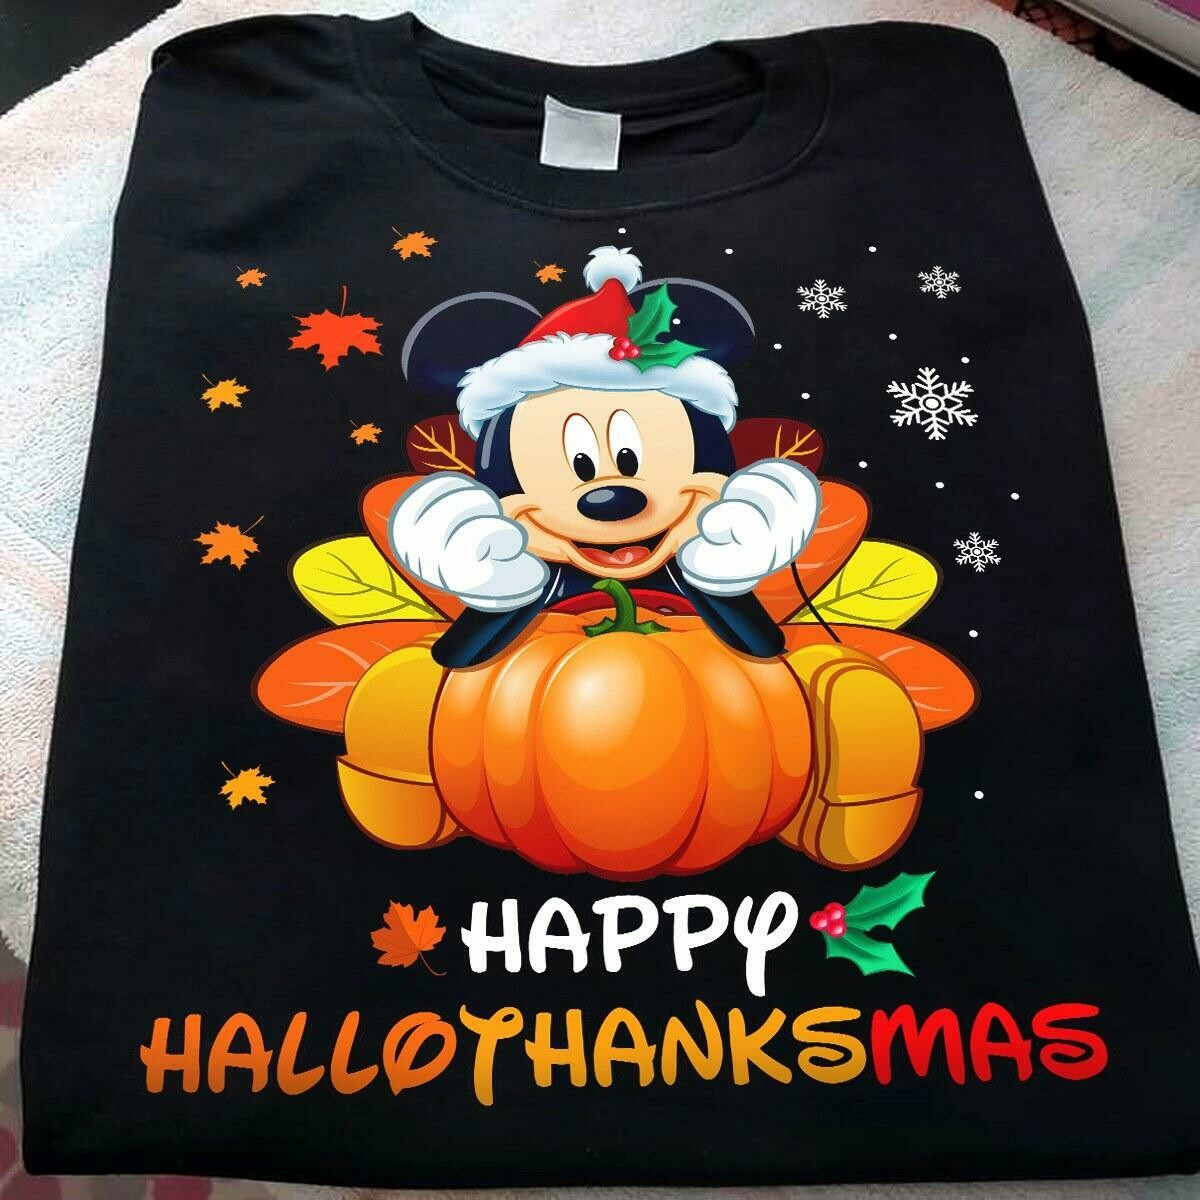 Halloween Disney Mickey Happy Hallothanksmas Christmas shirt